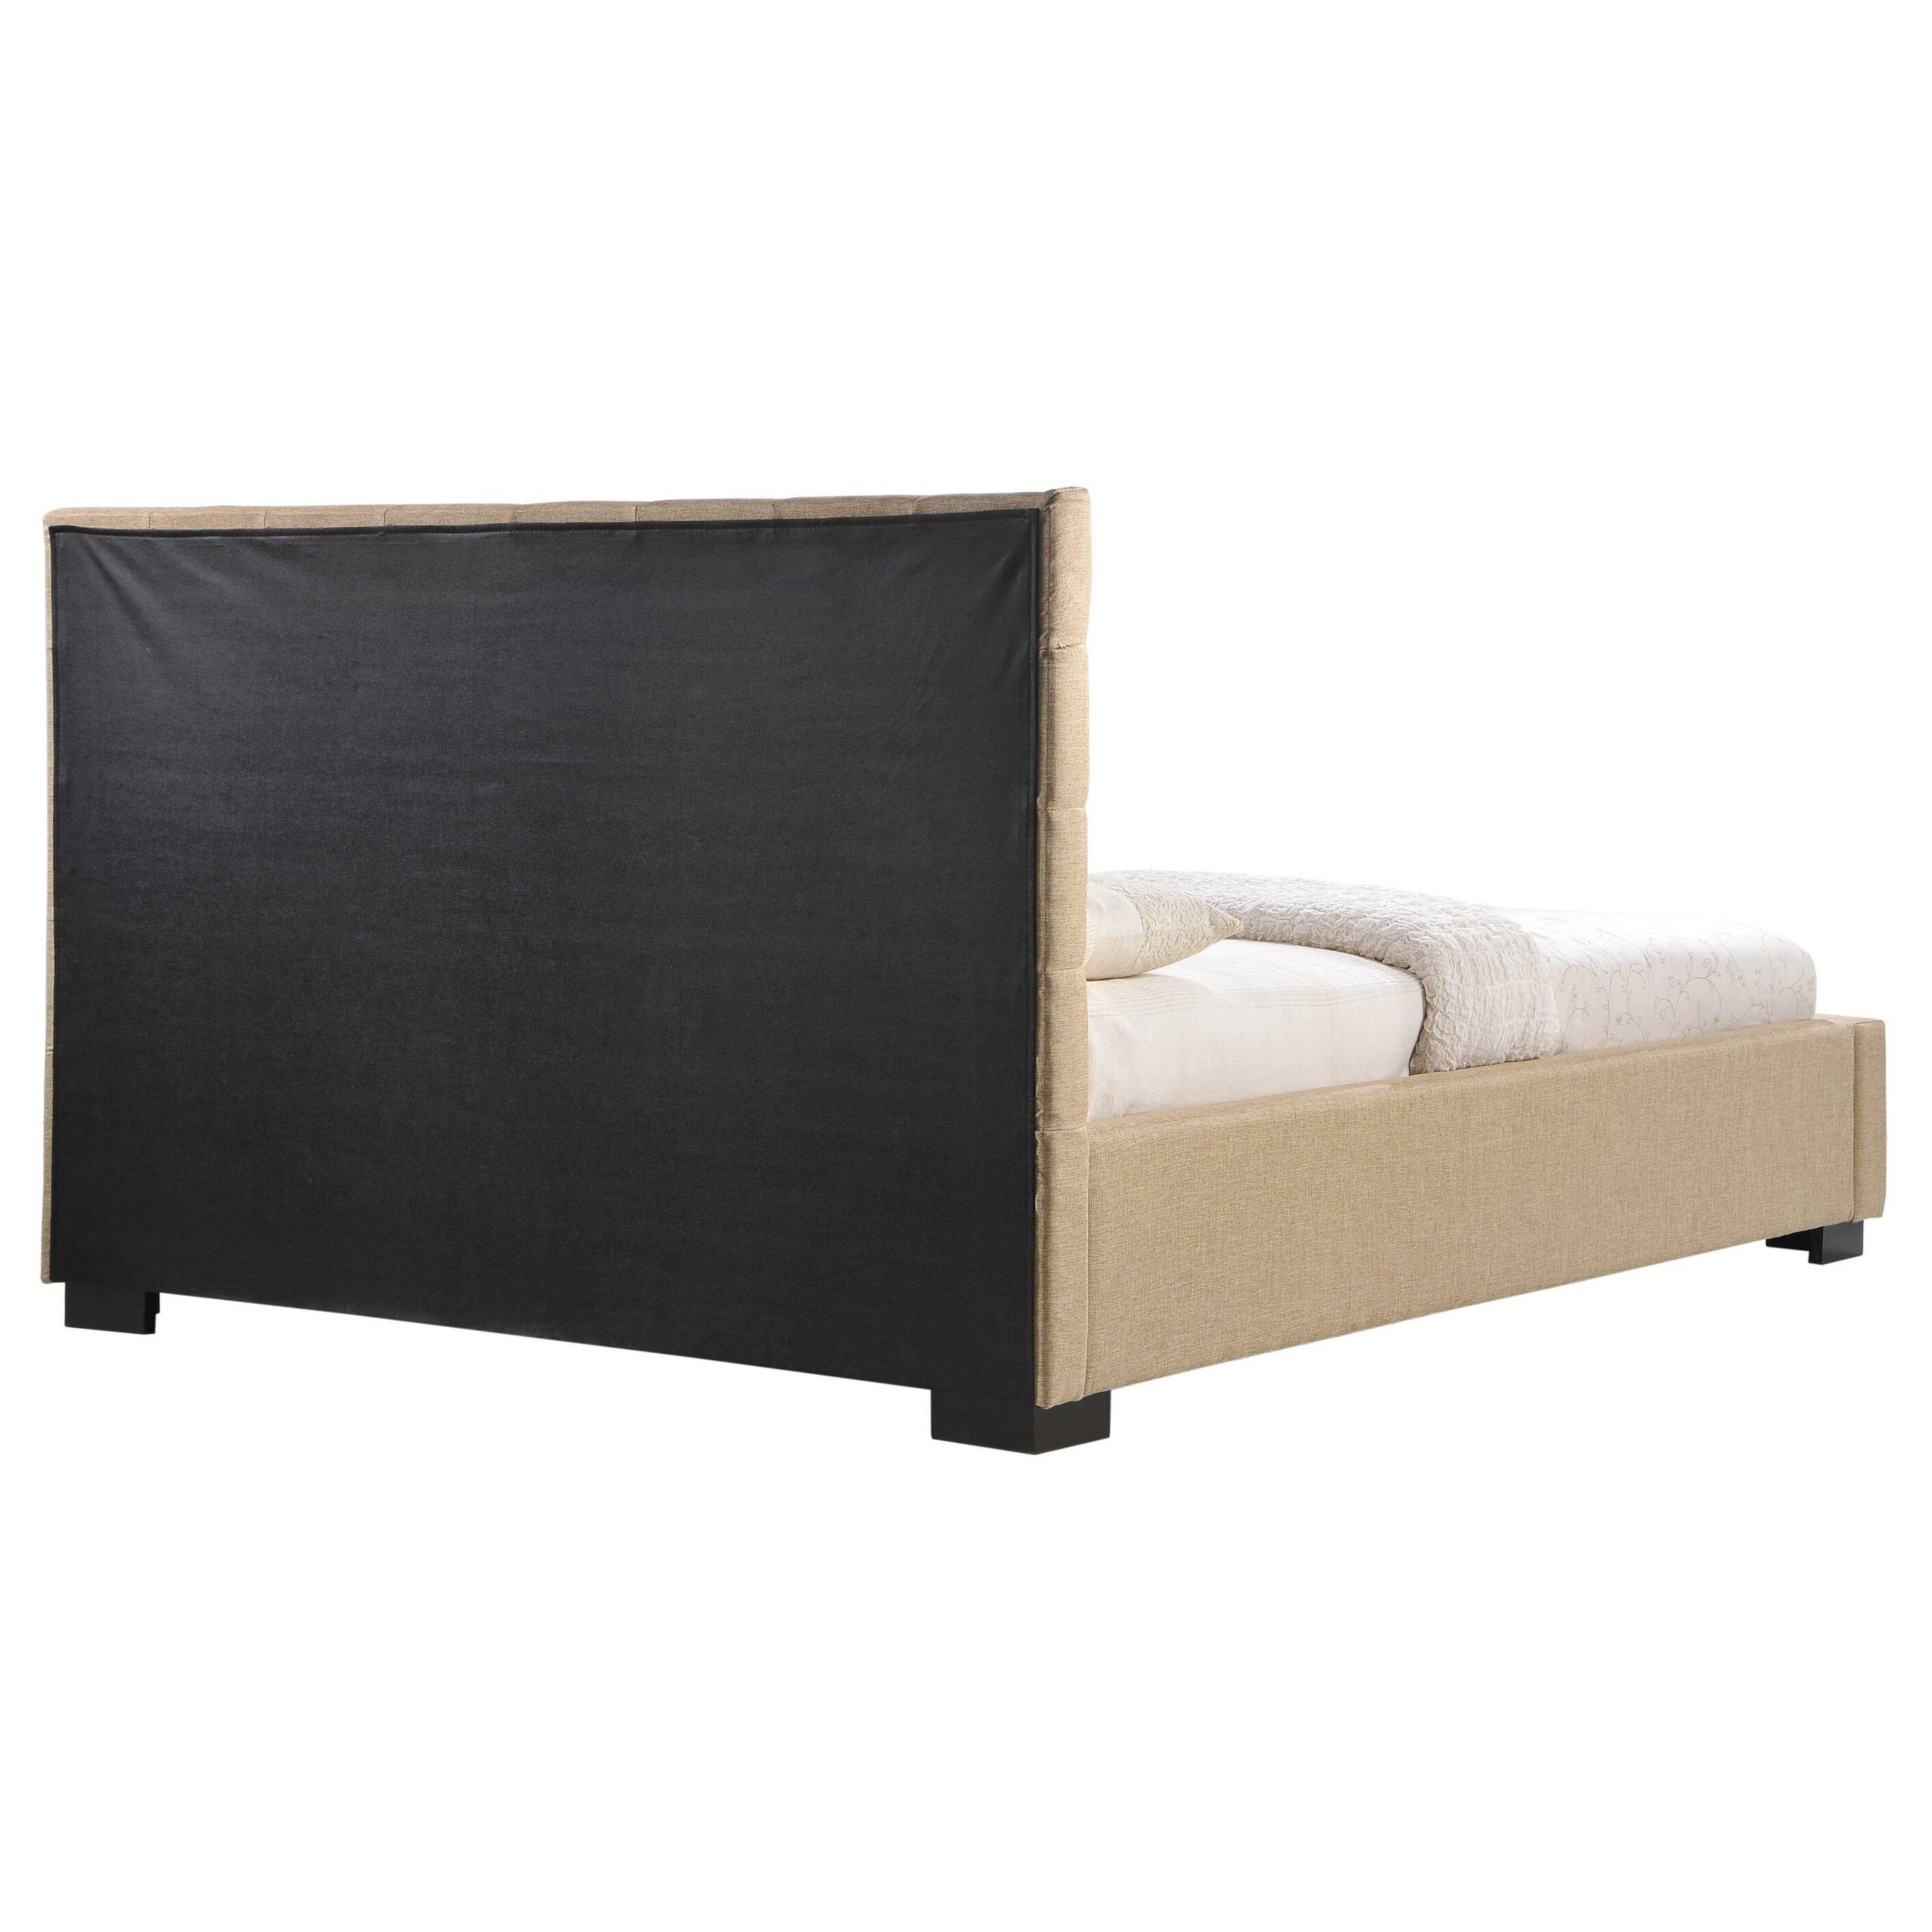 Luxeo Upholstered Platform Bed Reviews Wayfair